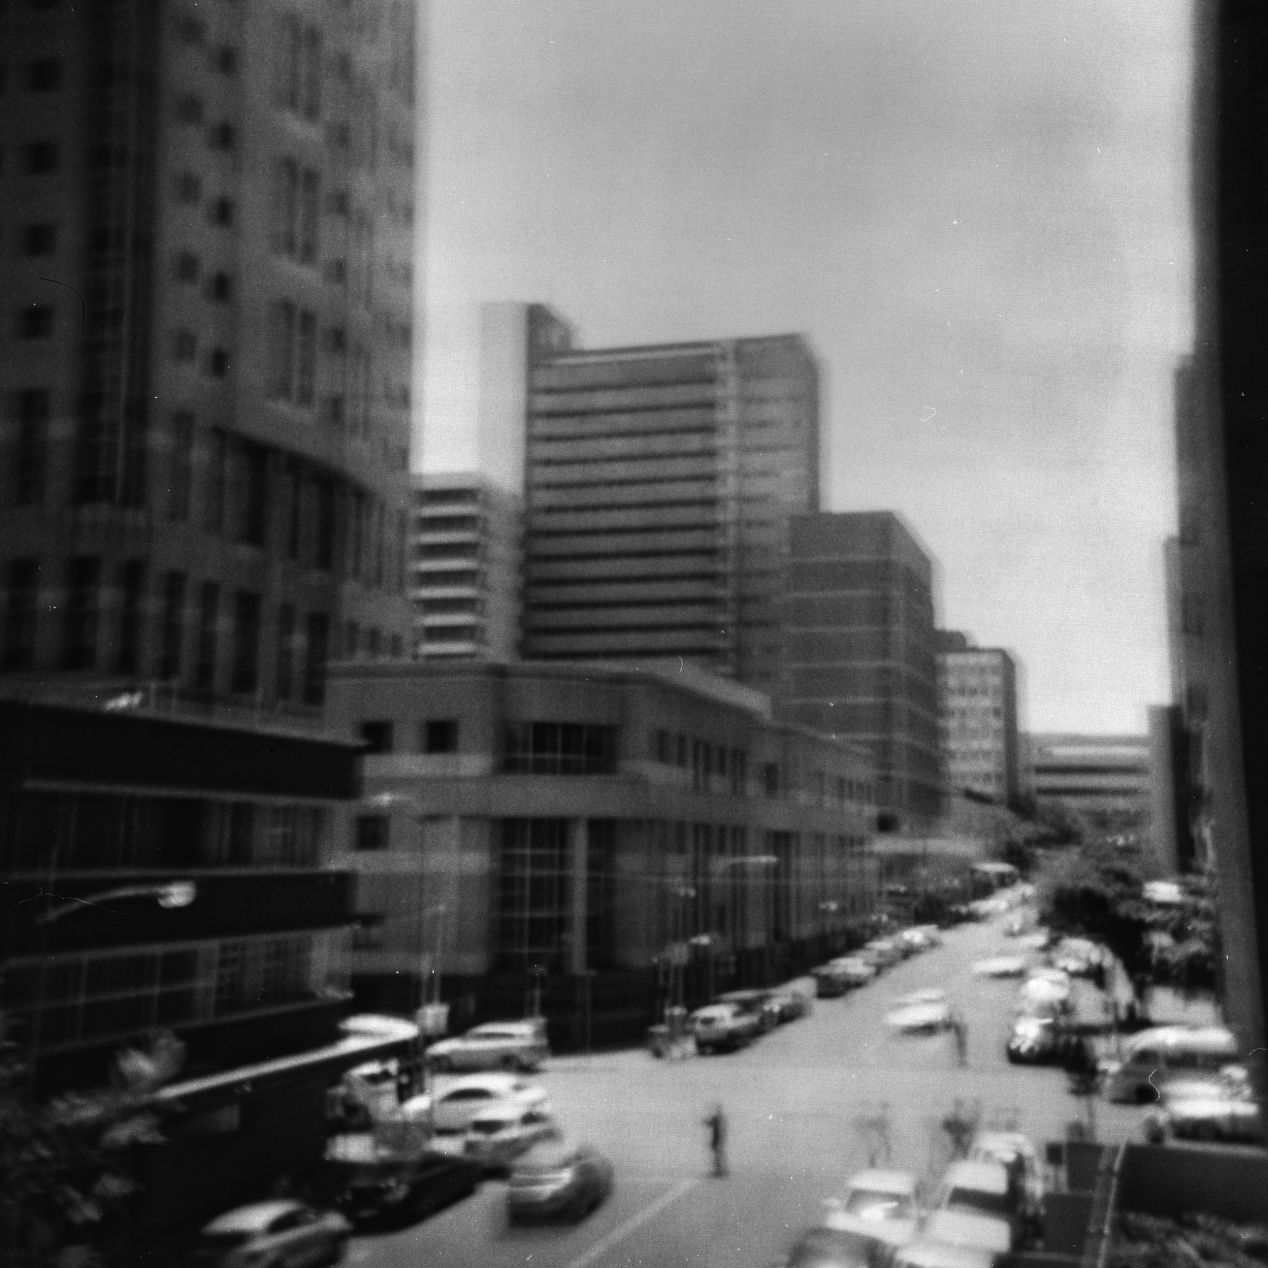 Johannesburg, 2015